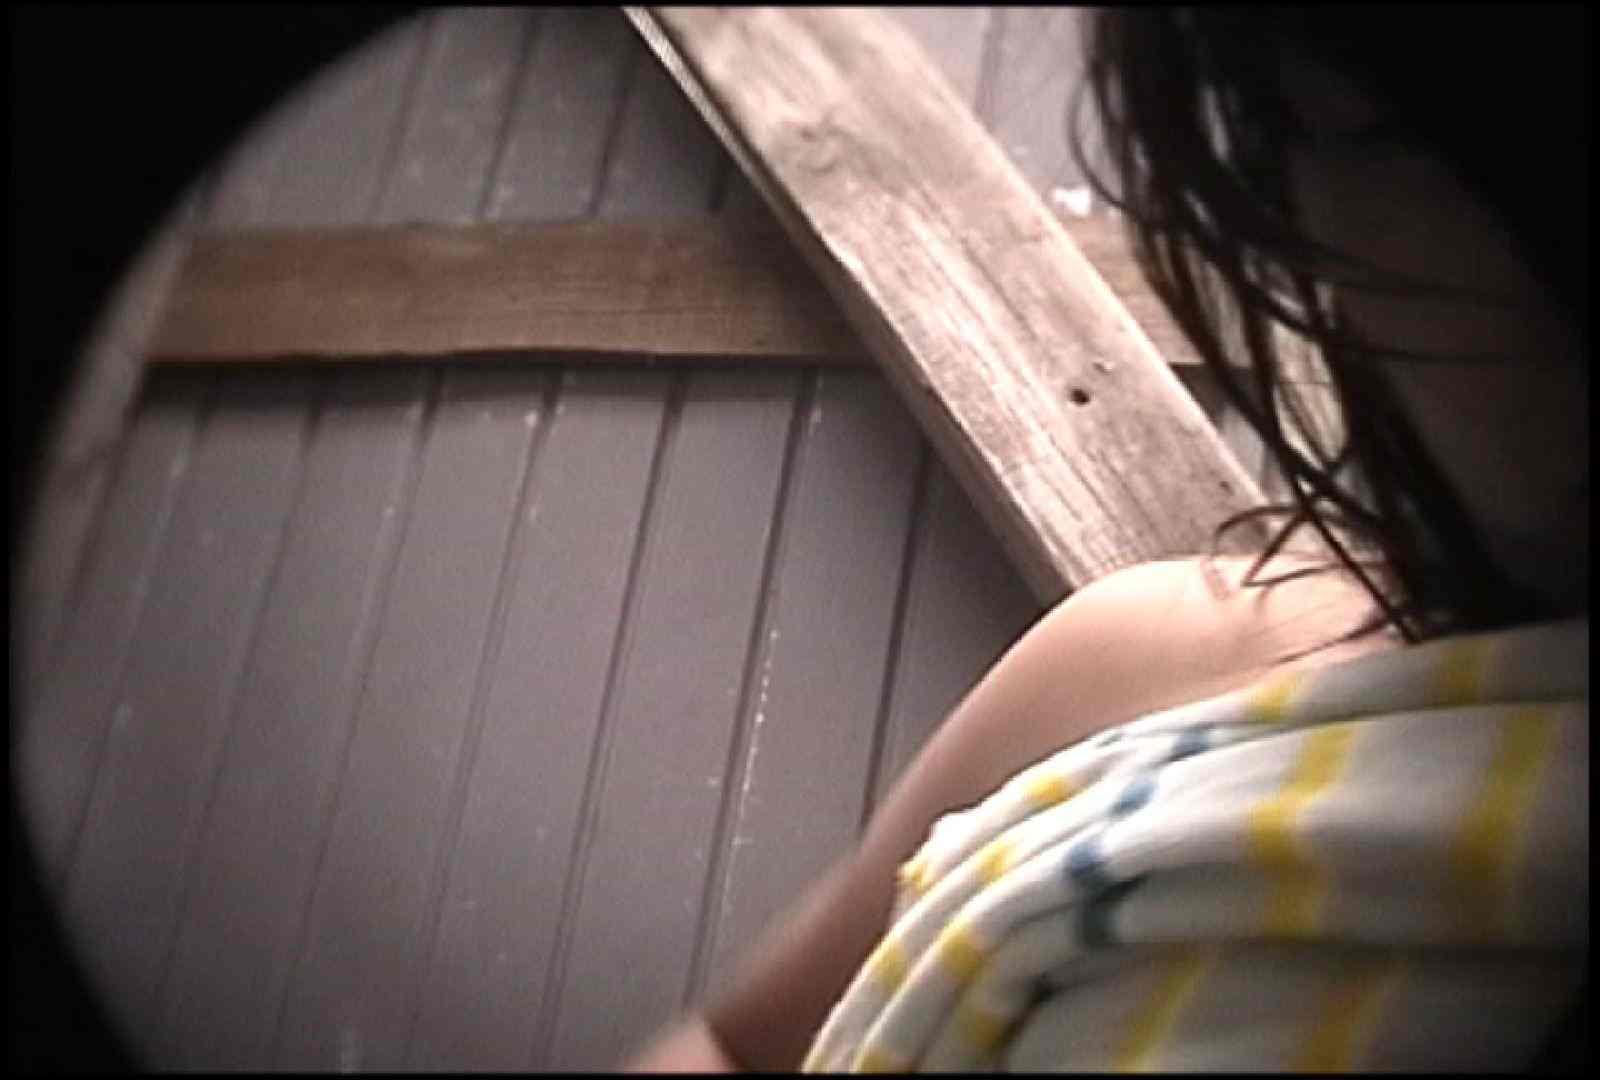 No.134 年増のぽっこりお腹 むっちりガール オマンコ無修正動画無料 98枚 74